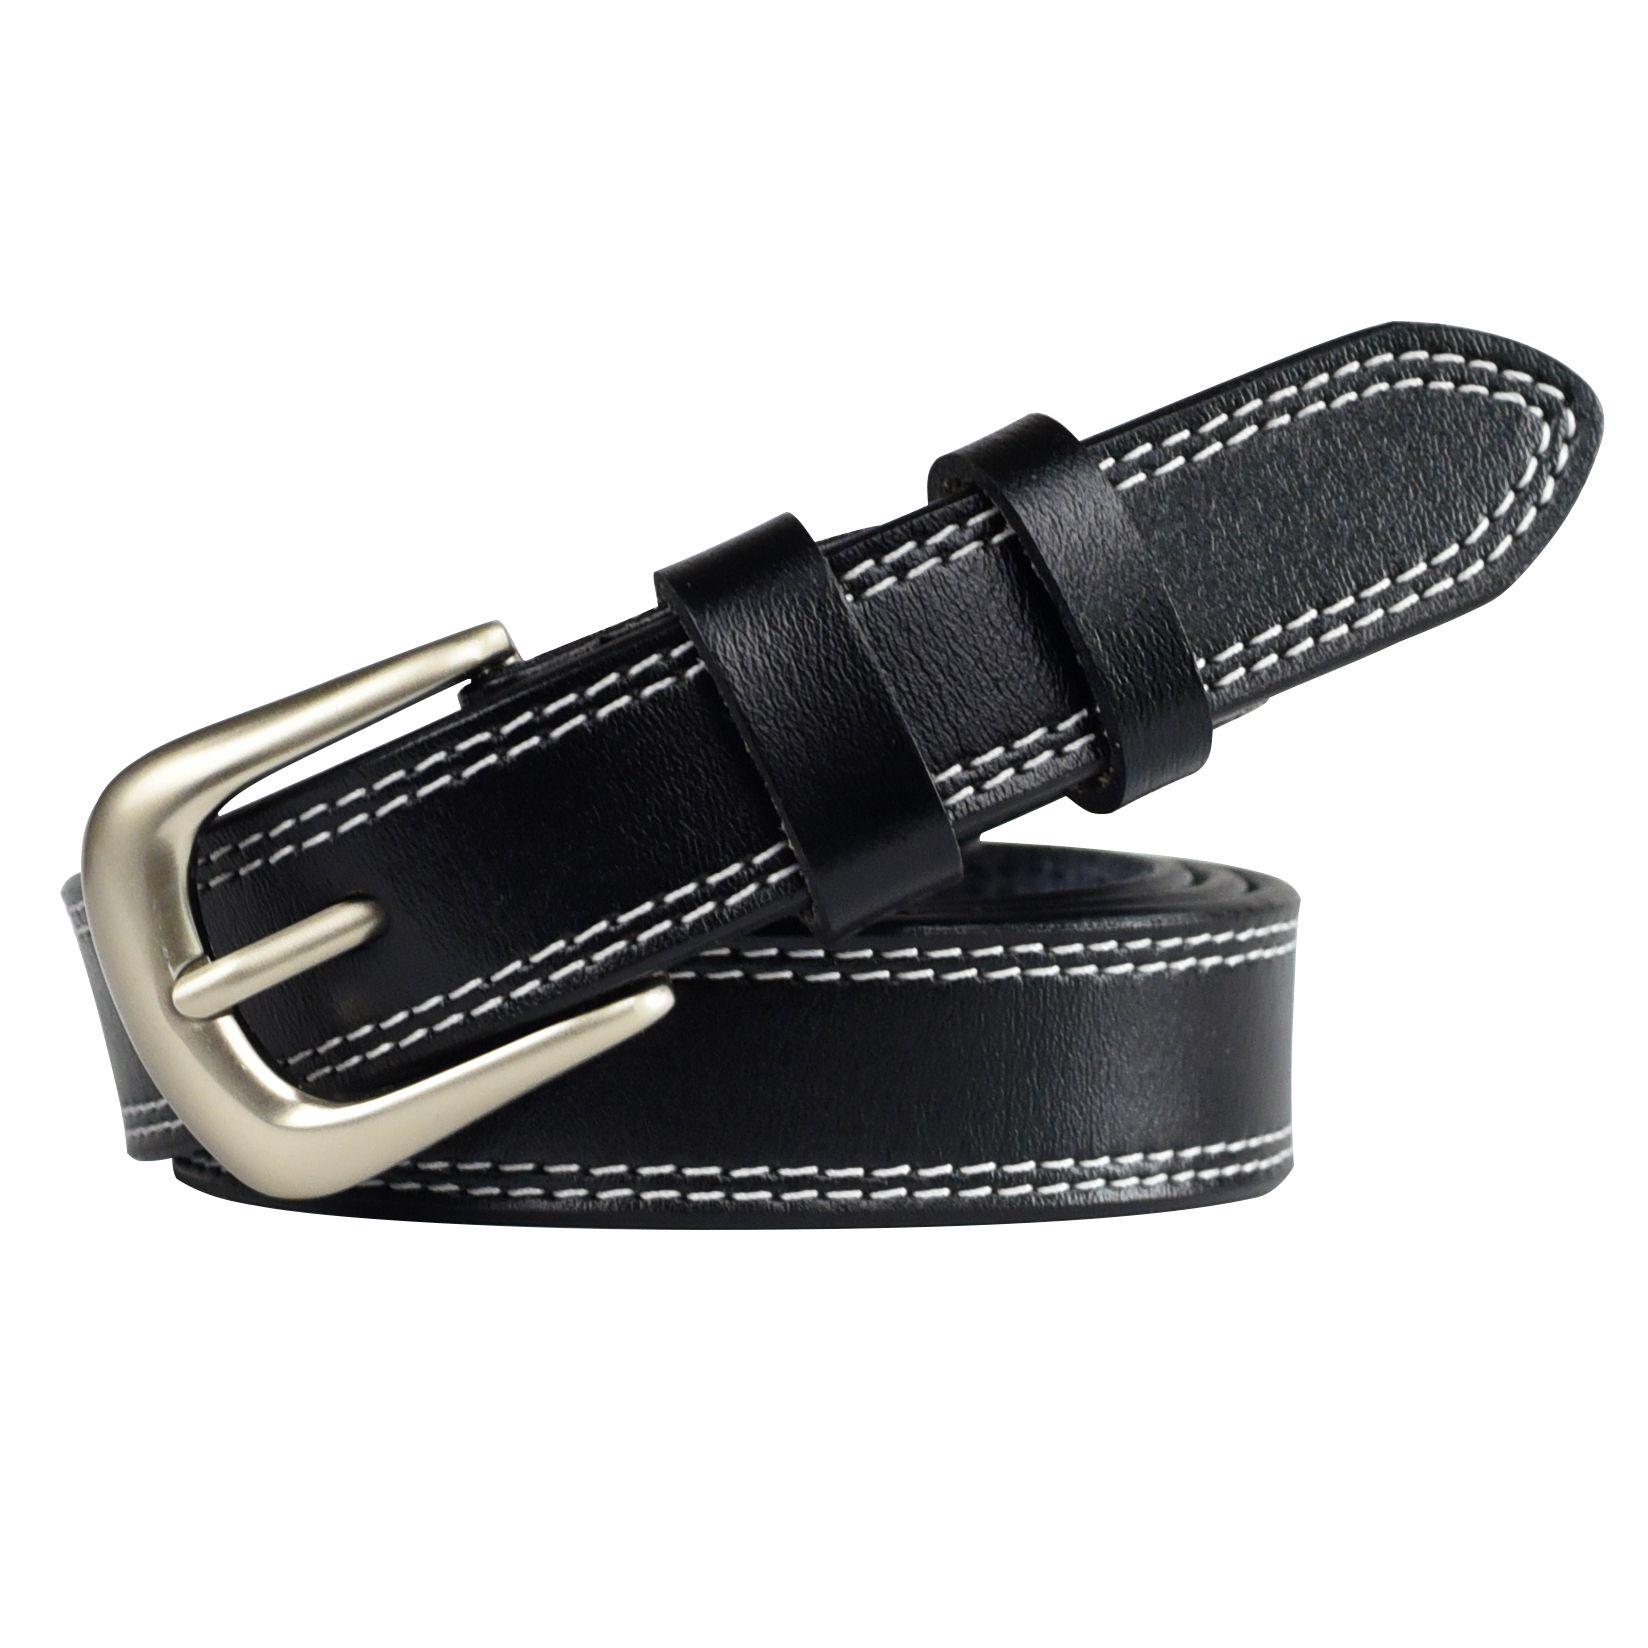 e45843fa8 [SUMEIKE] 100% Genuine Leather Belts For Women Cummerbunds Strap Waist Thin  Female Belt //Price: $27.89 & FREE Shipping // #Jewelry